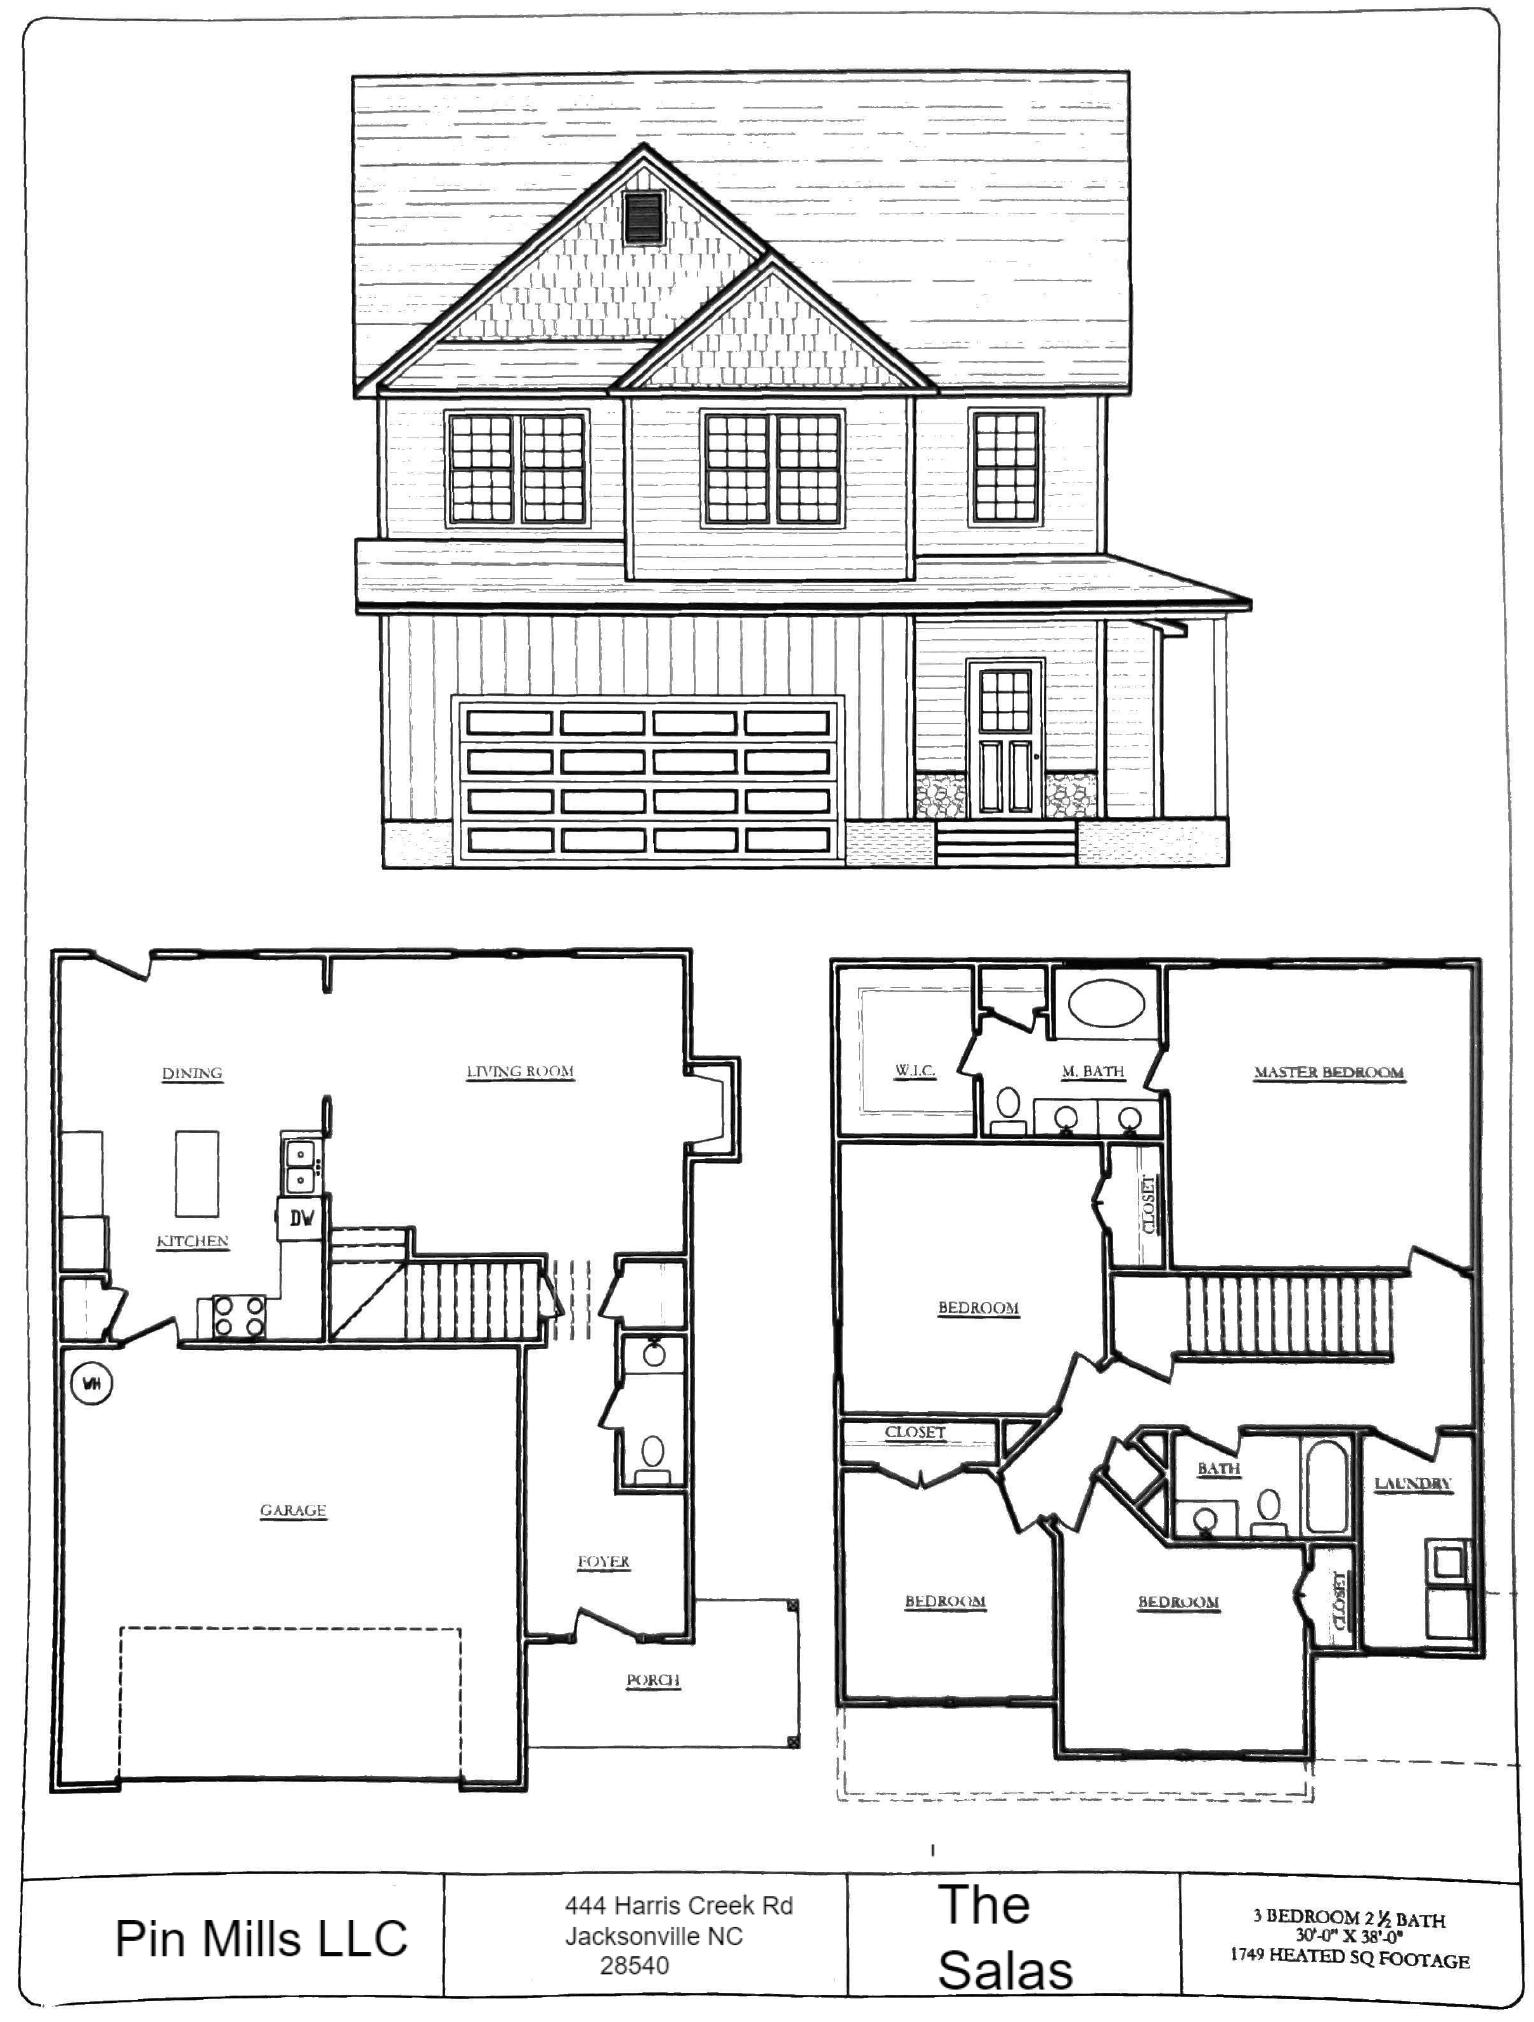 flooplan blueprints for the Southwest Plantation Salas home